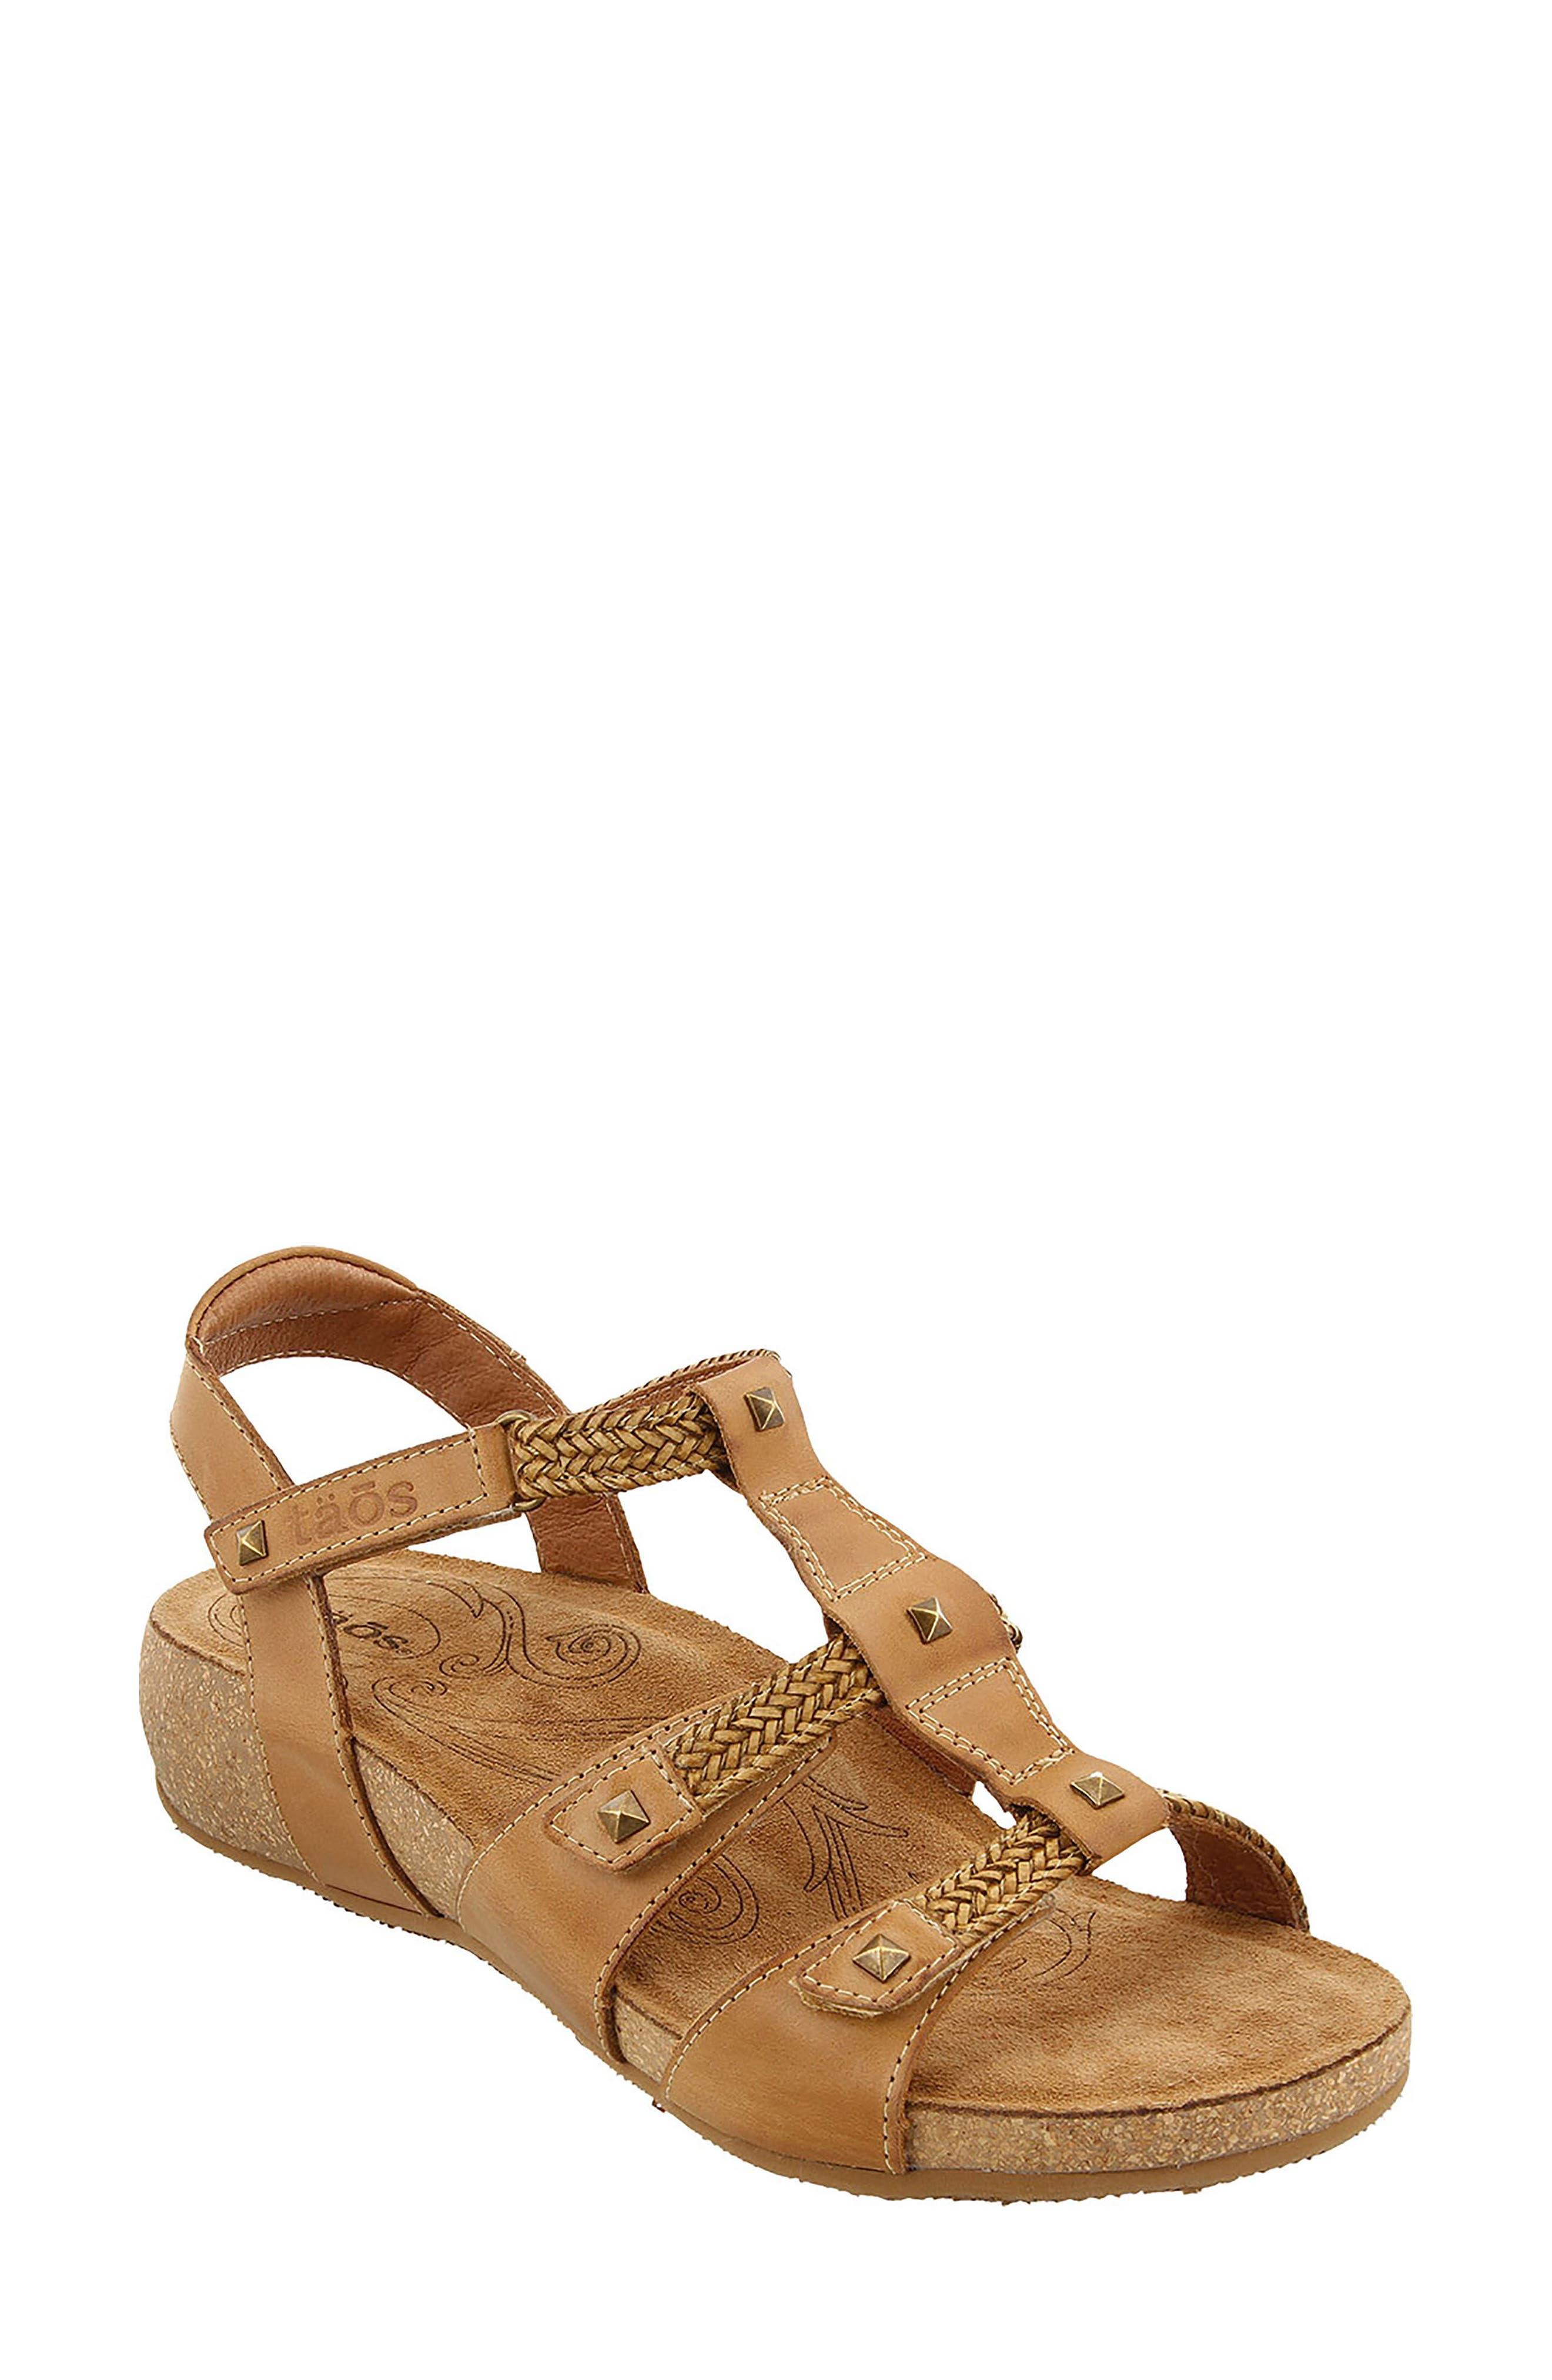 Eleanor Sandal,                         Main,                         color, Camel Leather